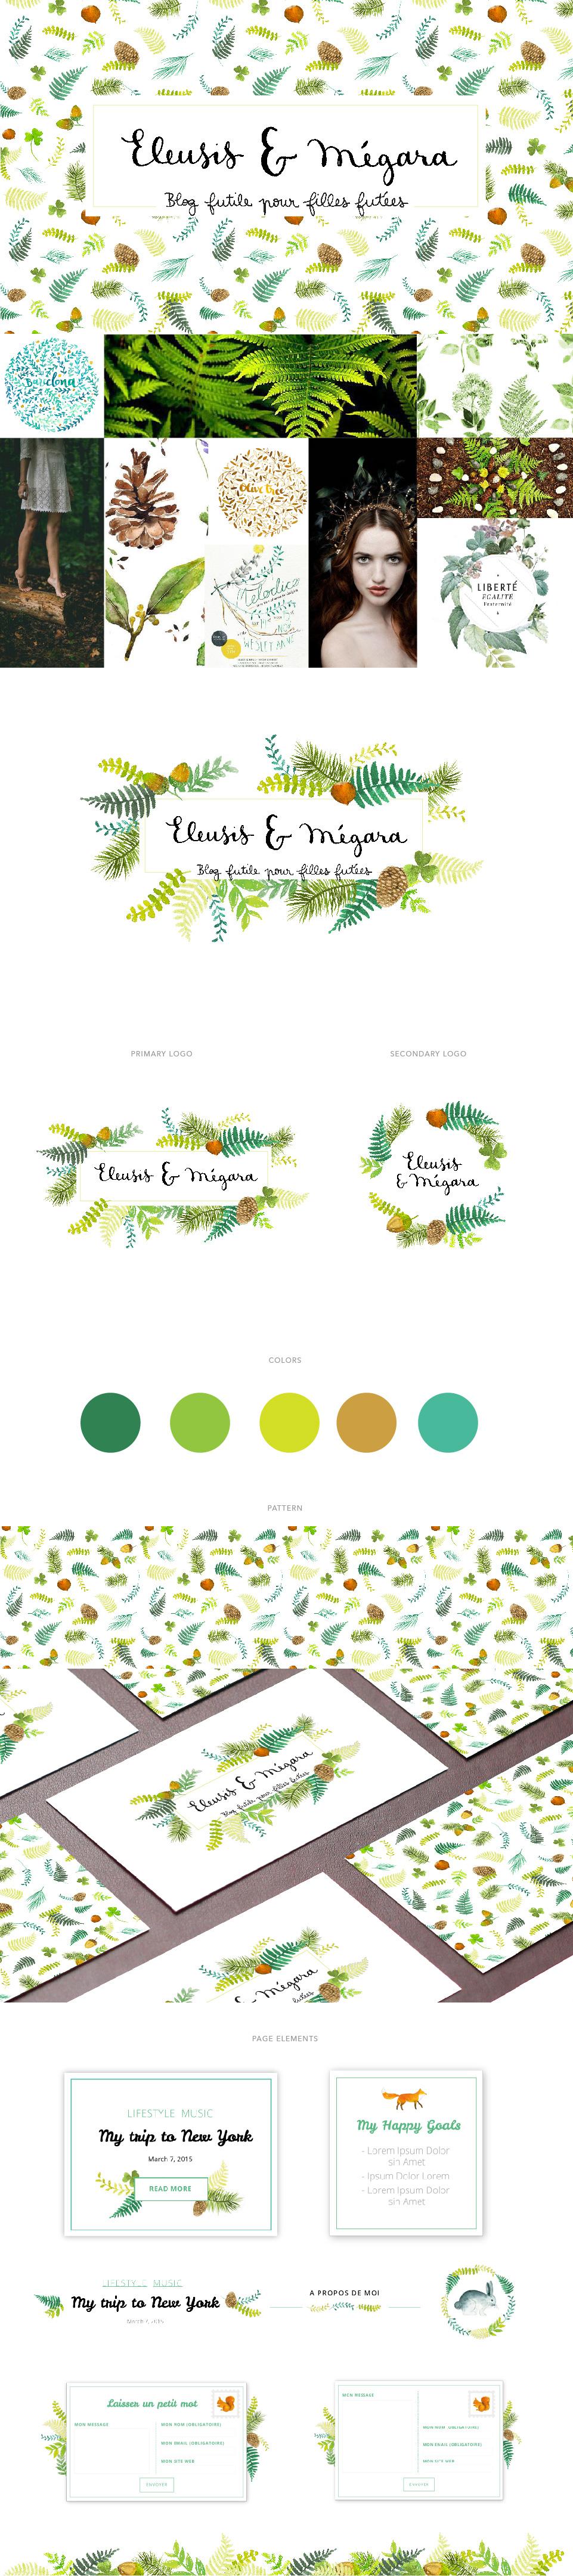 presentation branding eleusis megara-08.jpg